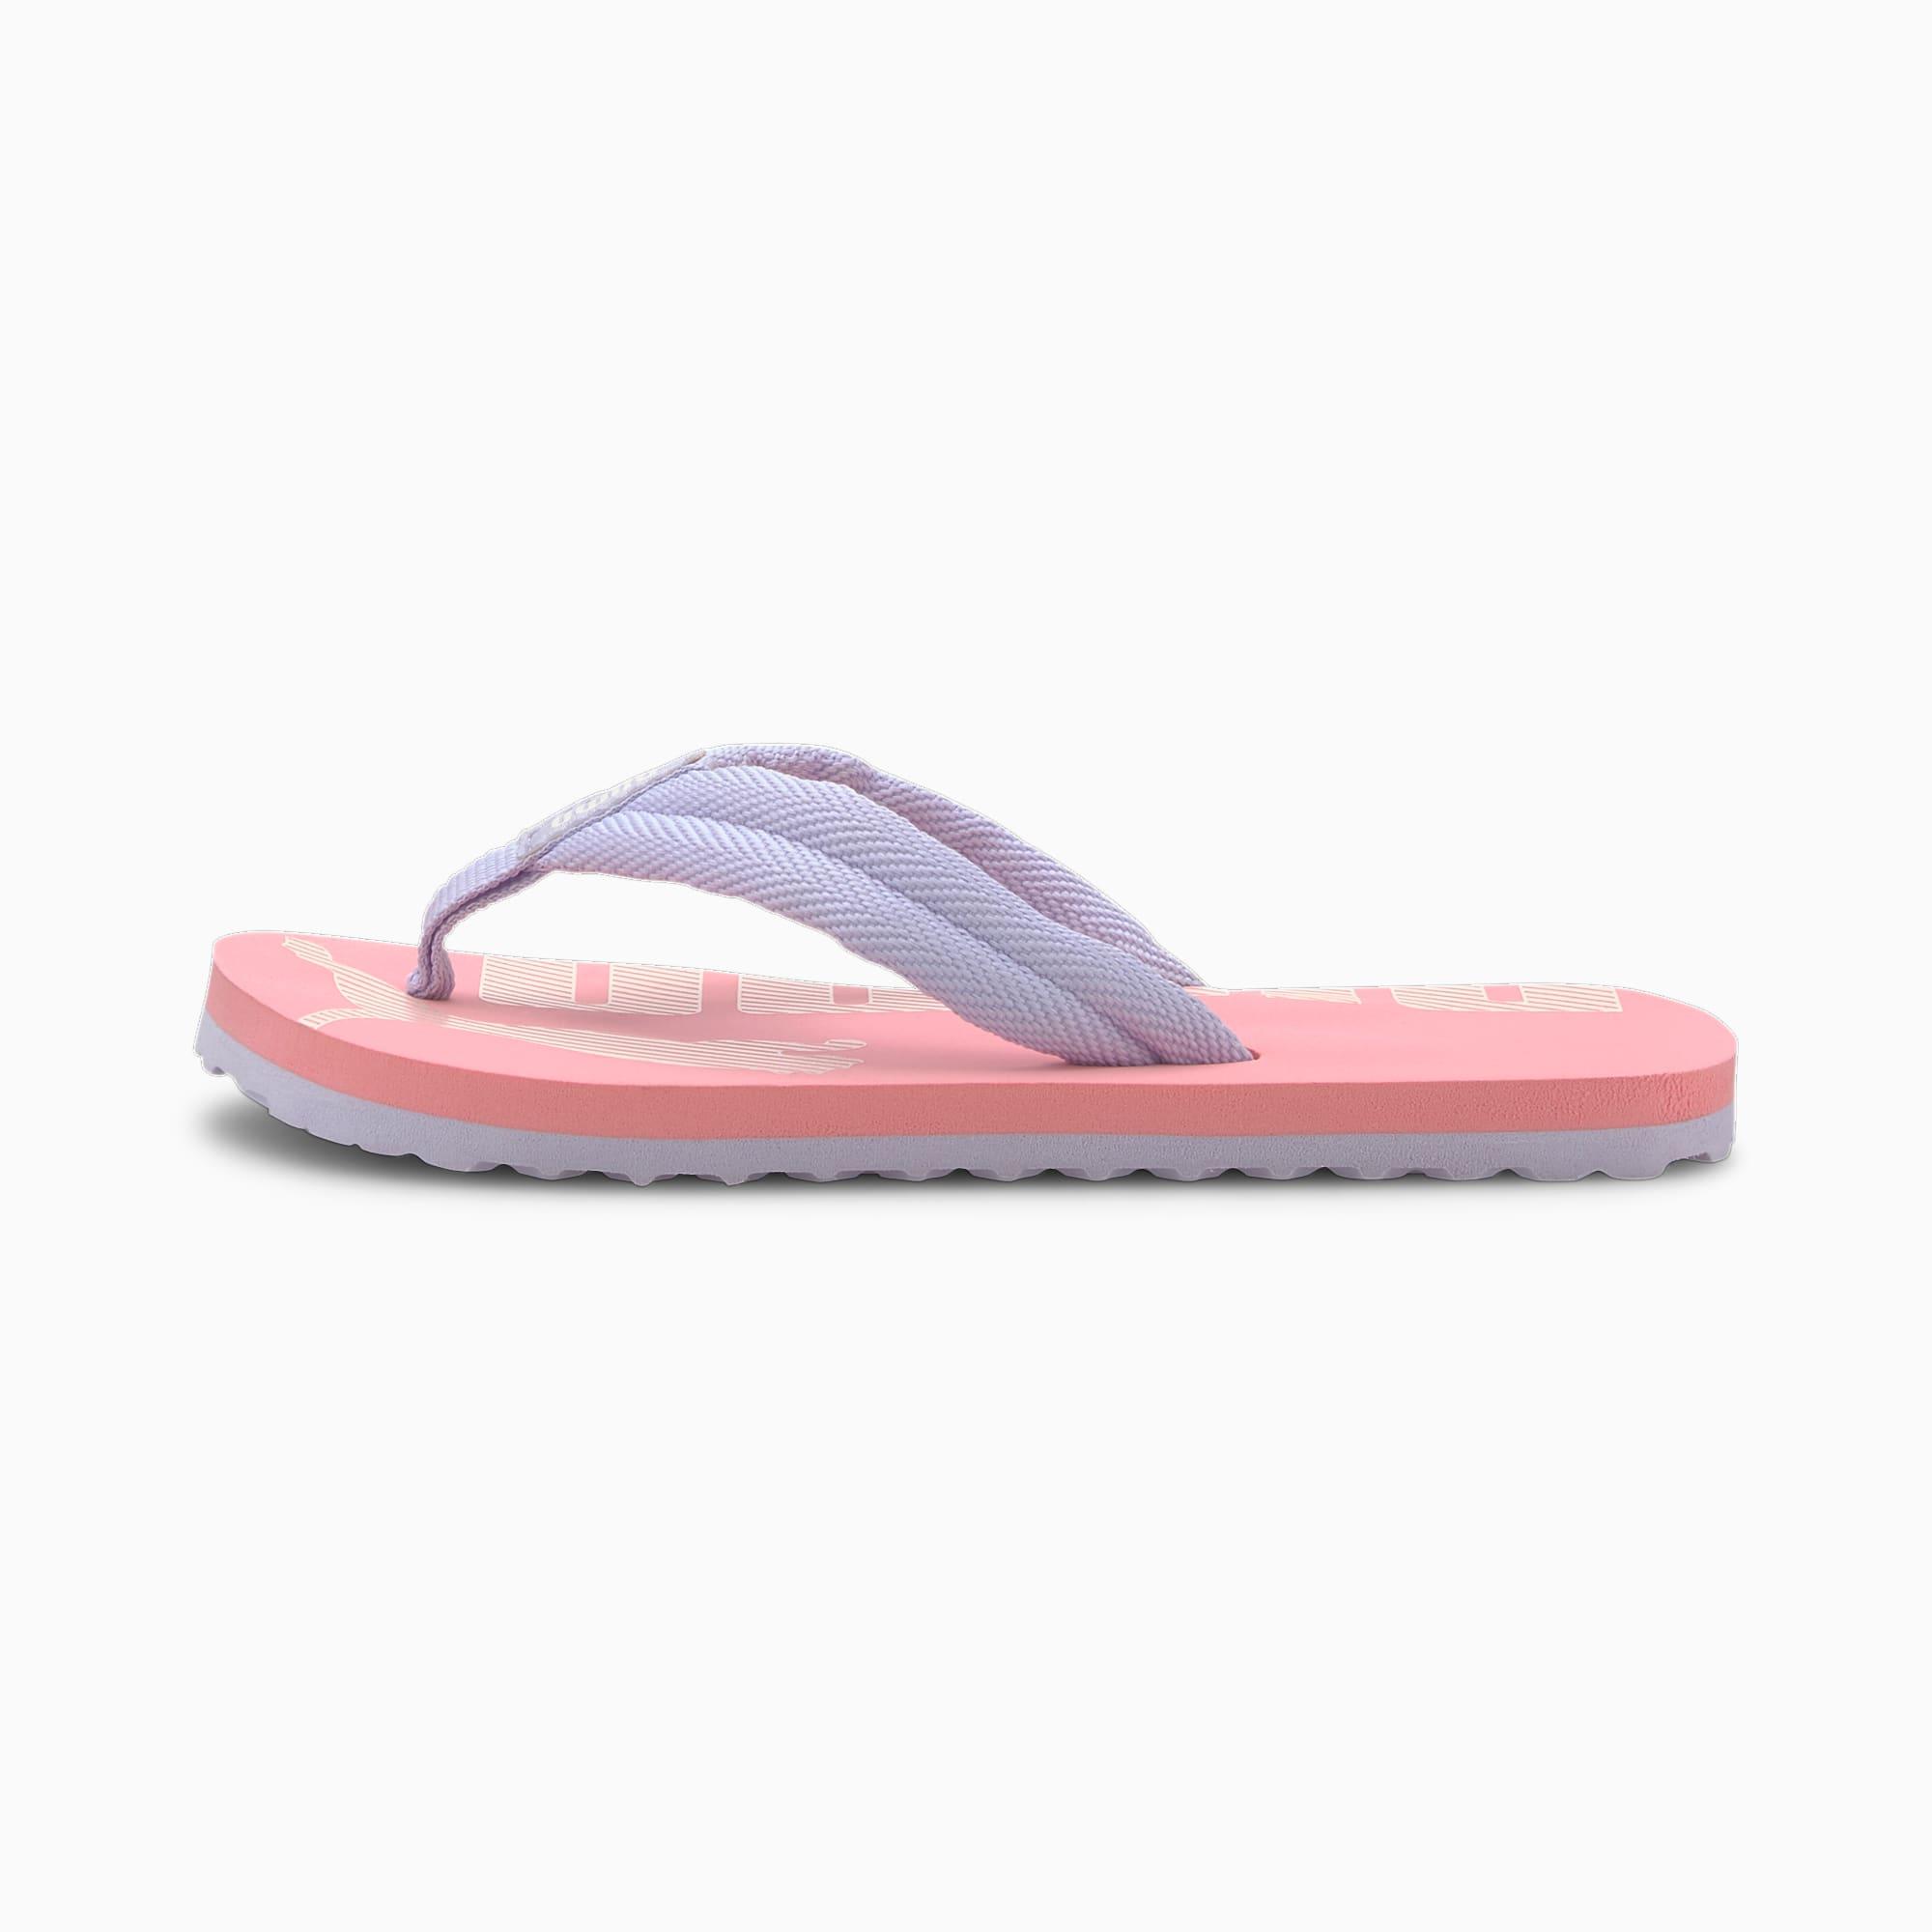 PUMA Epic Flip V2 Preschool Kids' Trainers, Peony/Purple Heather, size 11, Shoes